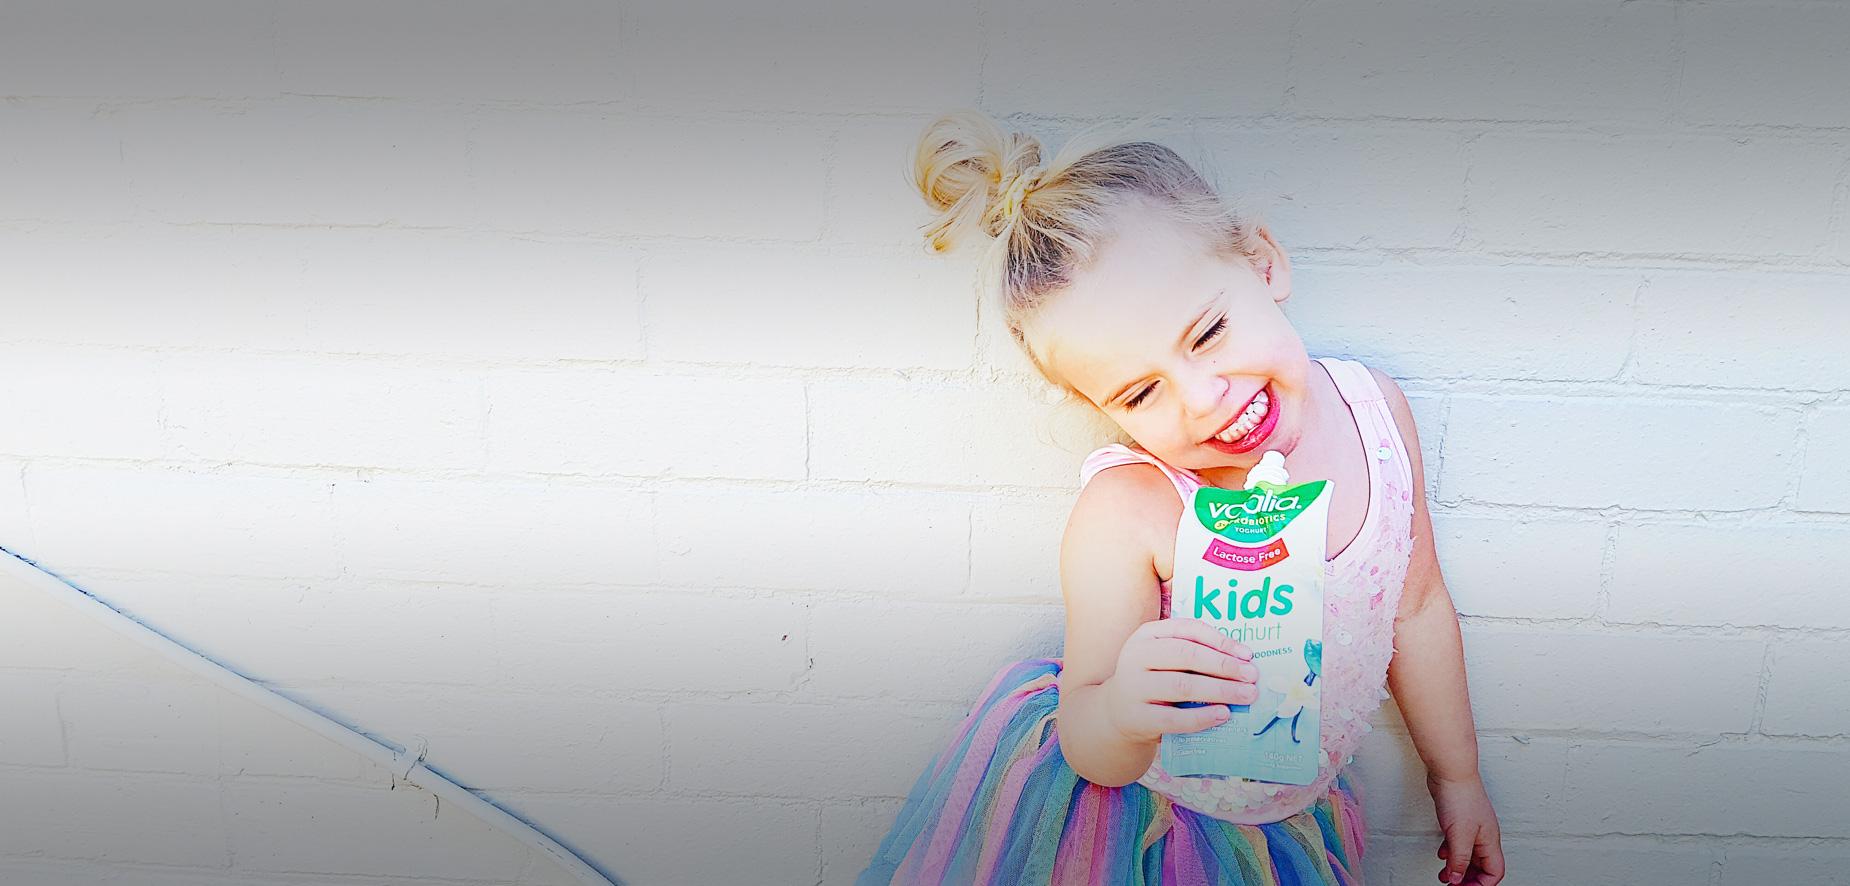 Image-2-KidsPage-overlay1